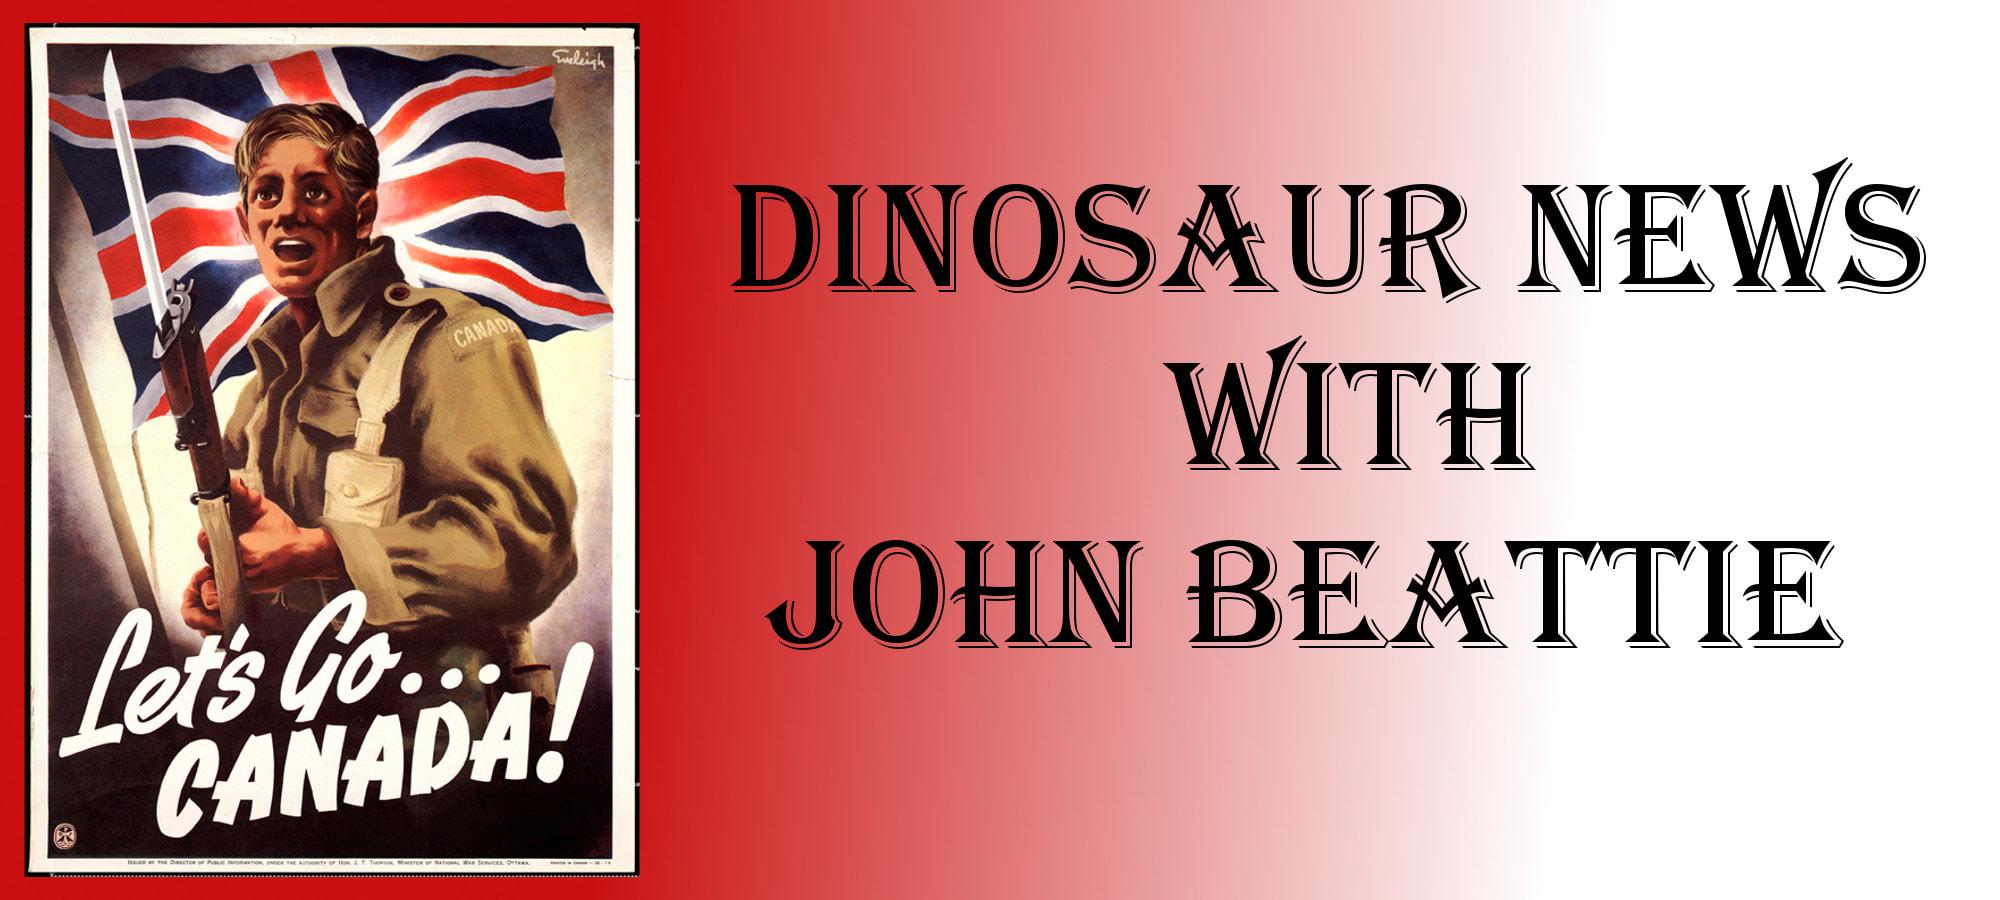 Dinosaur News with John Beattie